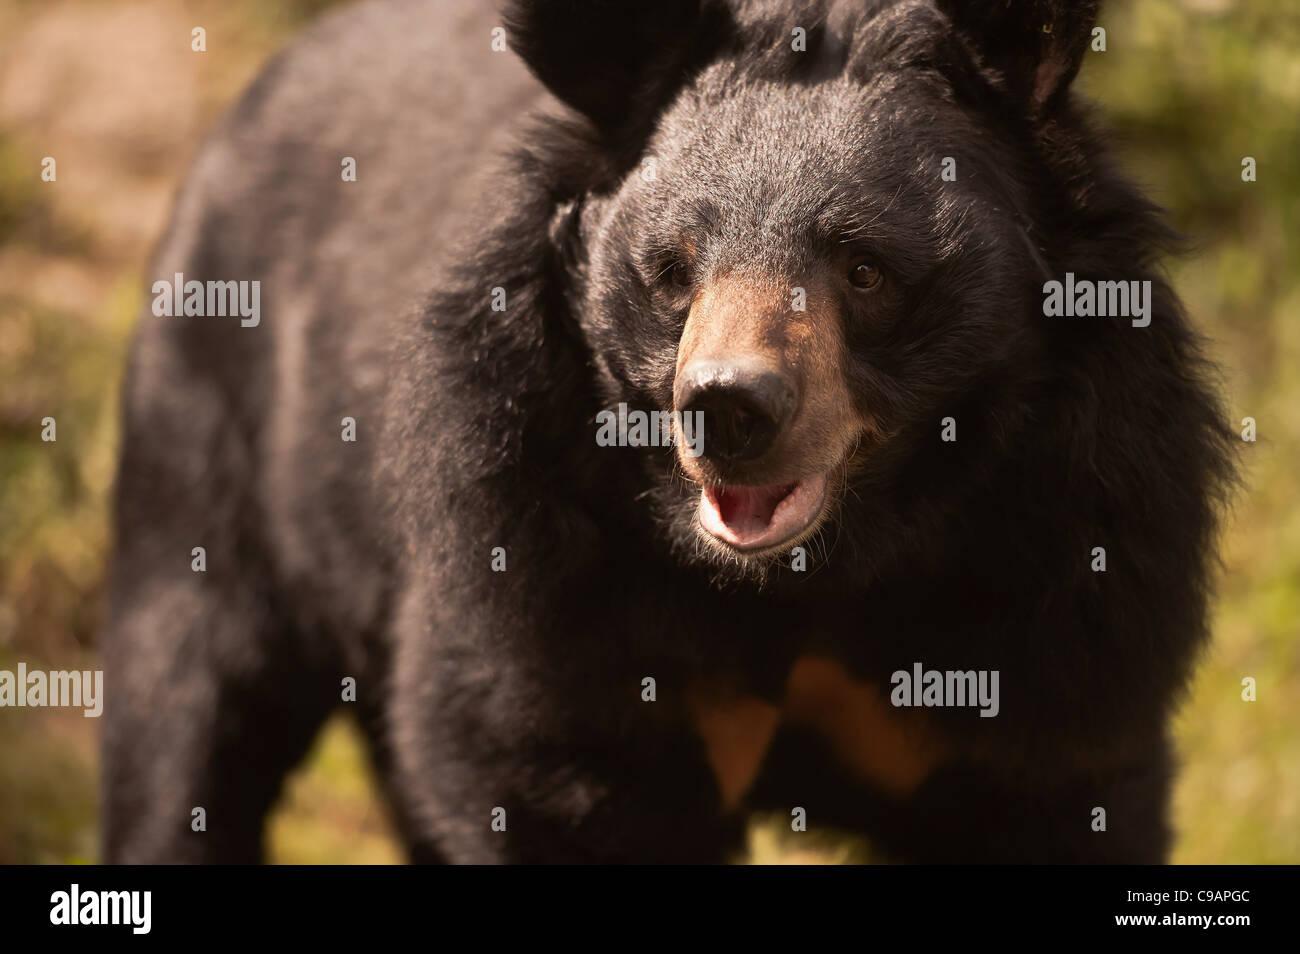 Bear  attacking  . - Stock Image